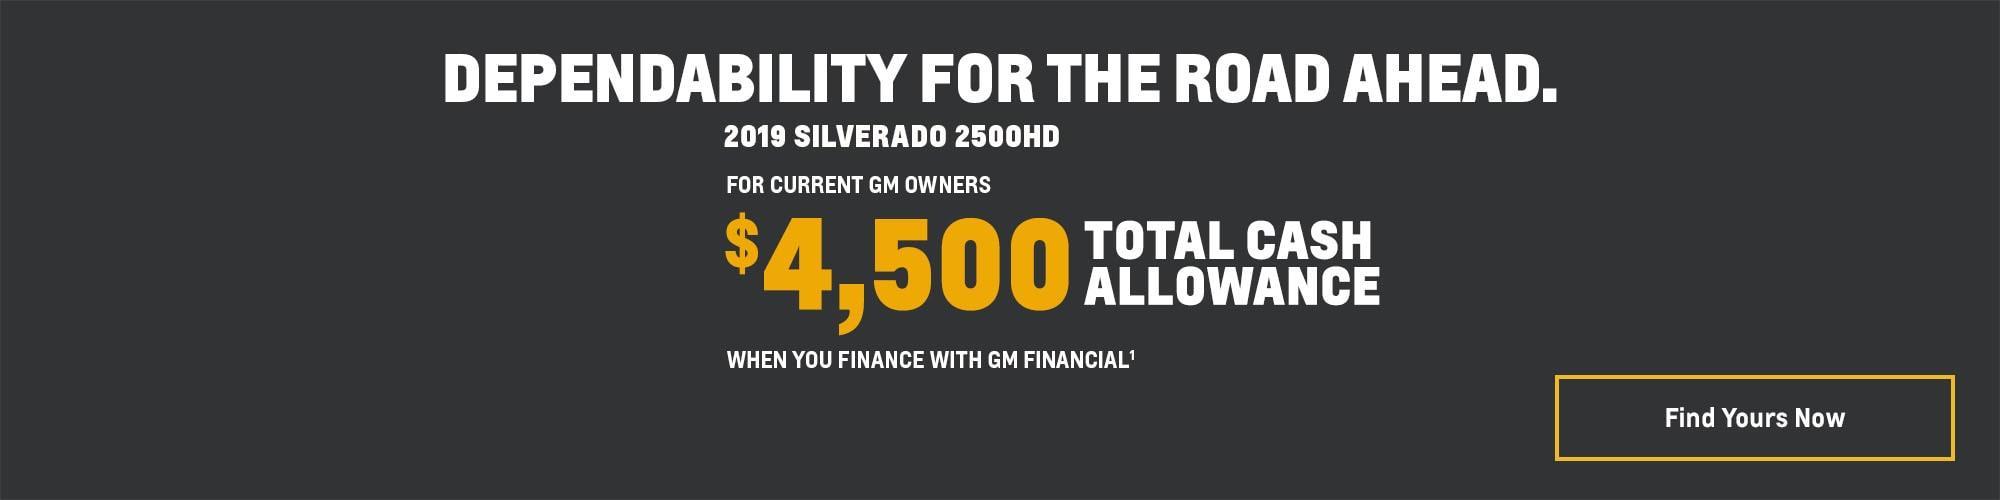 2019 Silverado 2500HD: $4,500 Total Cash Allowance